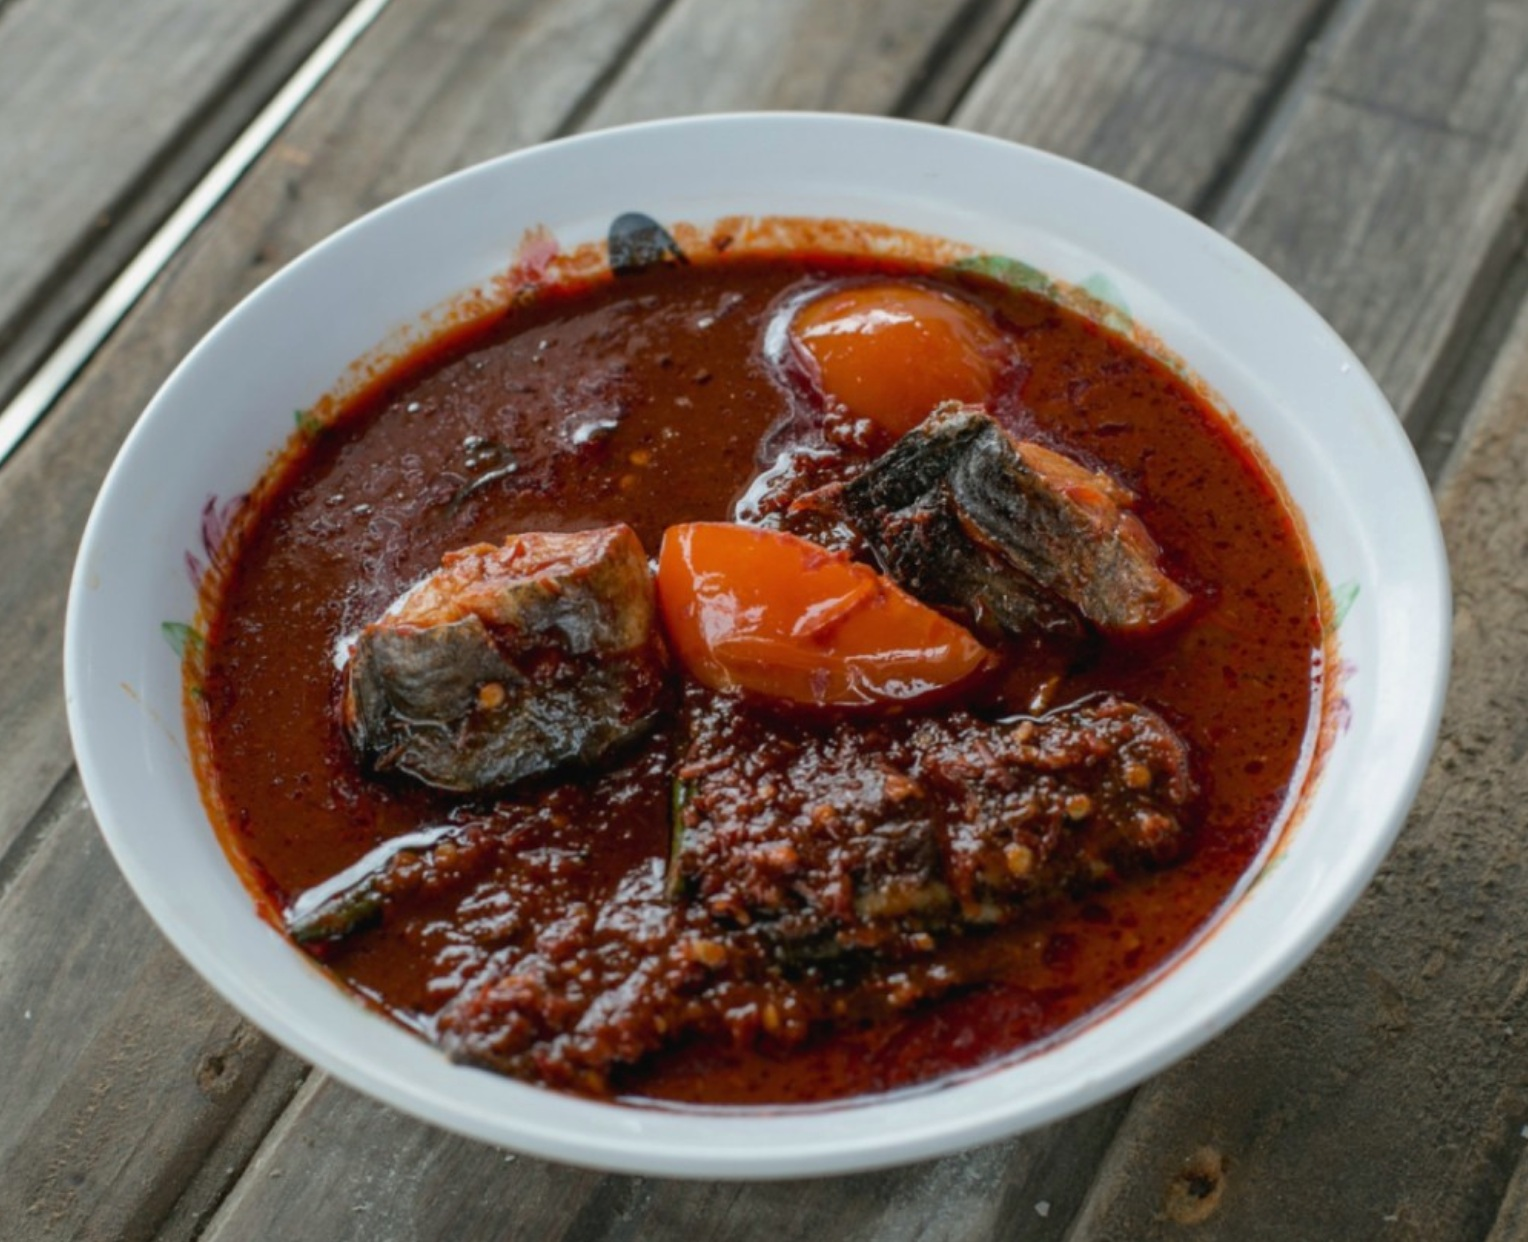 jalan jalan cari makan  picks Resepi Kari Daging Melaka Enak dan Mudah